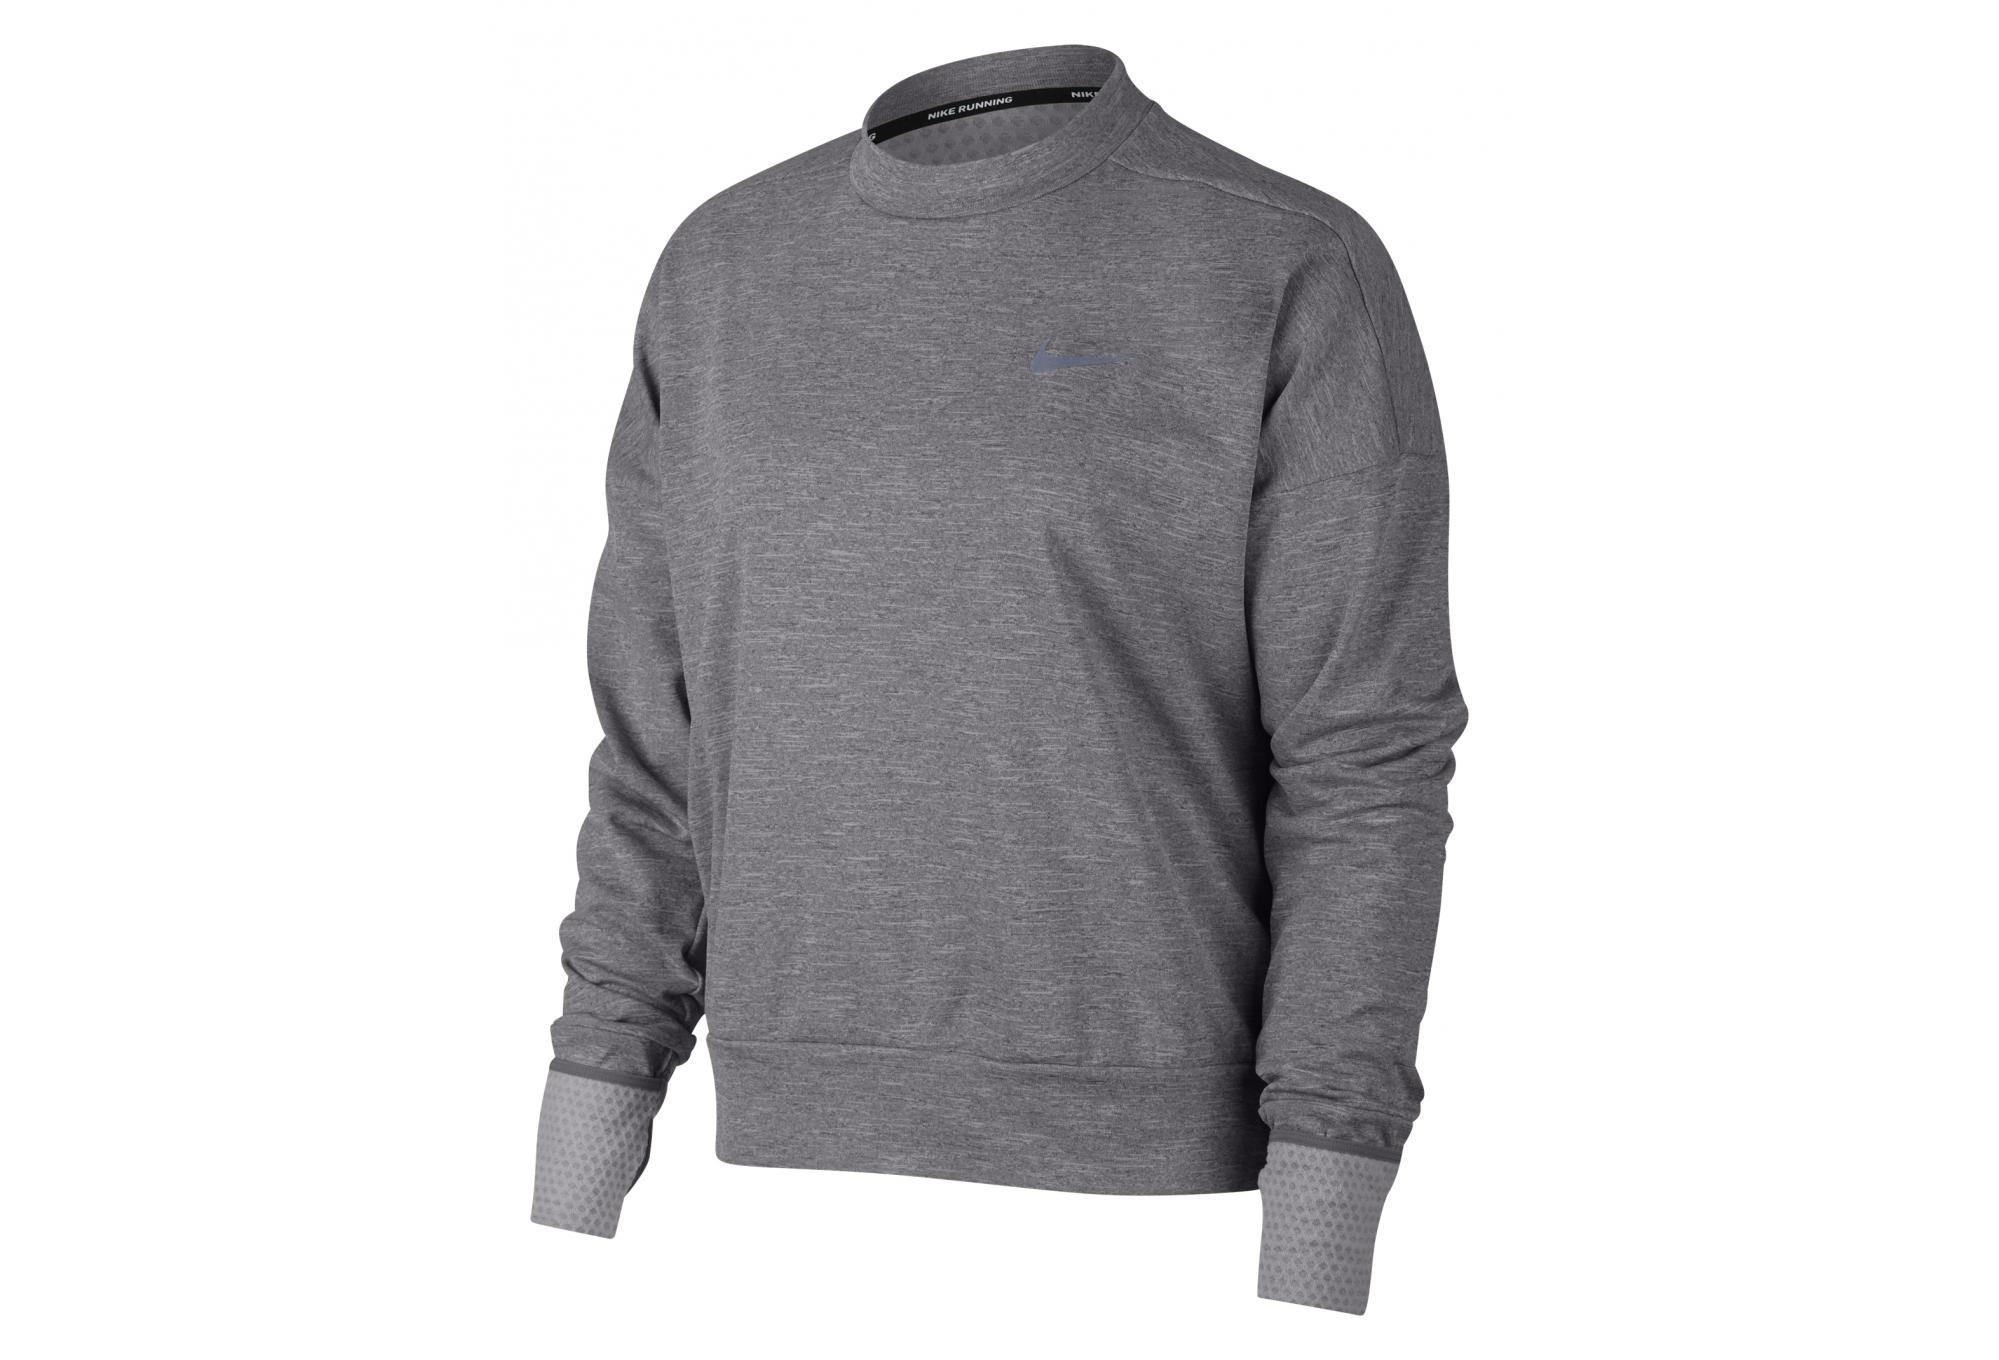 49a5ba22f Nike Therma Sphere Elet Women's Long Sleeves Jersey Grey | Alltricks.com